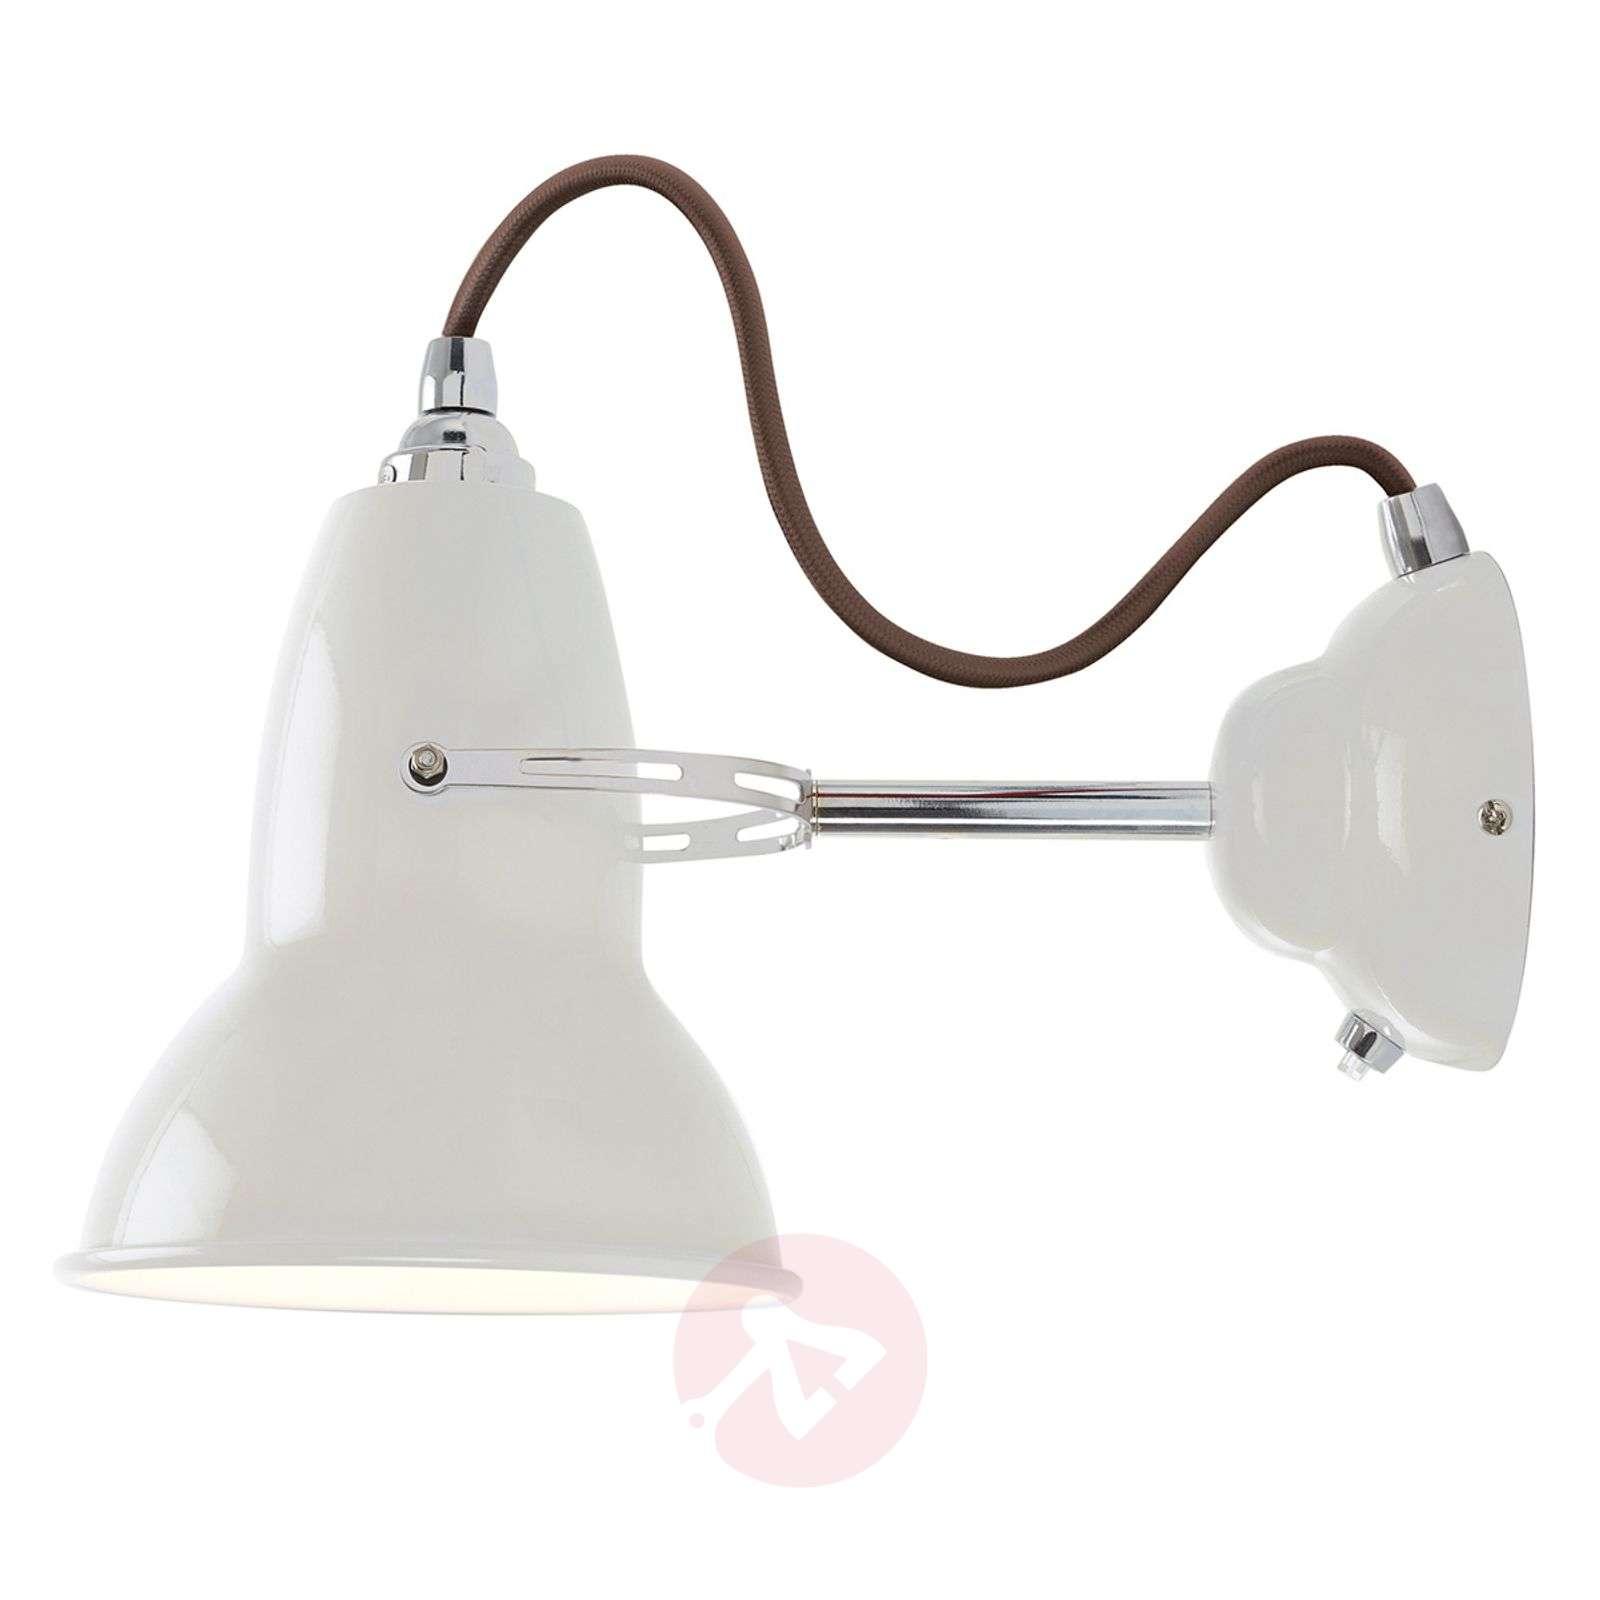 Anglepoise Original 1227 wall lamp-1073093X-01